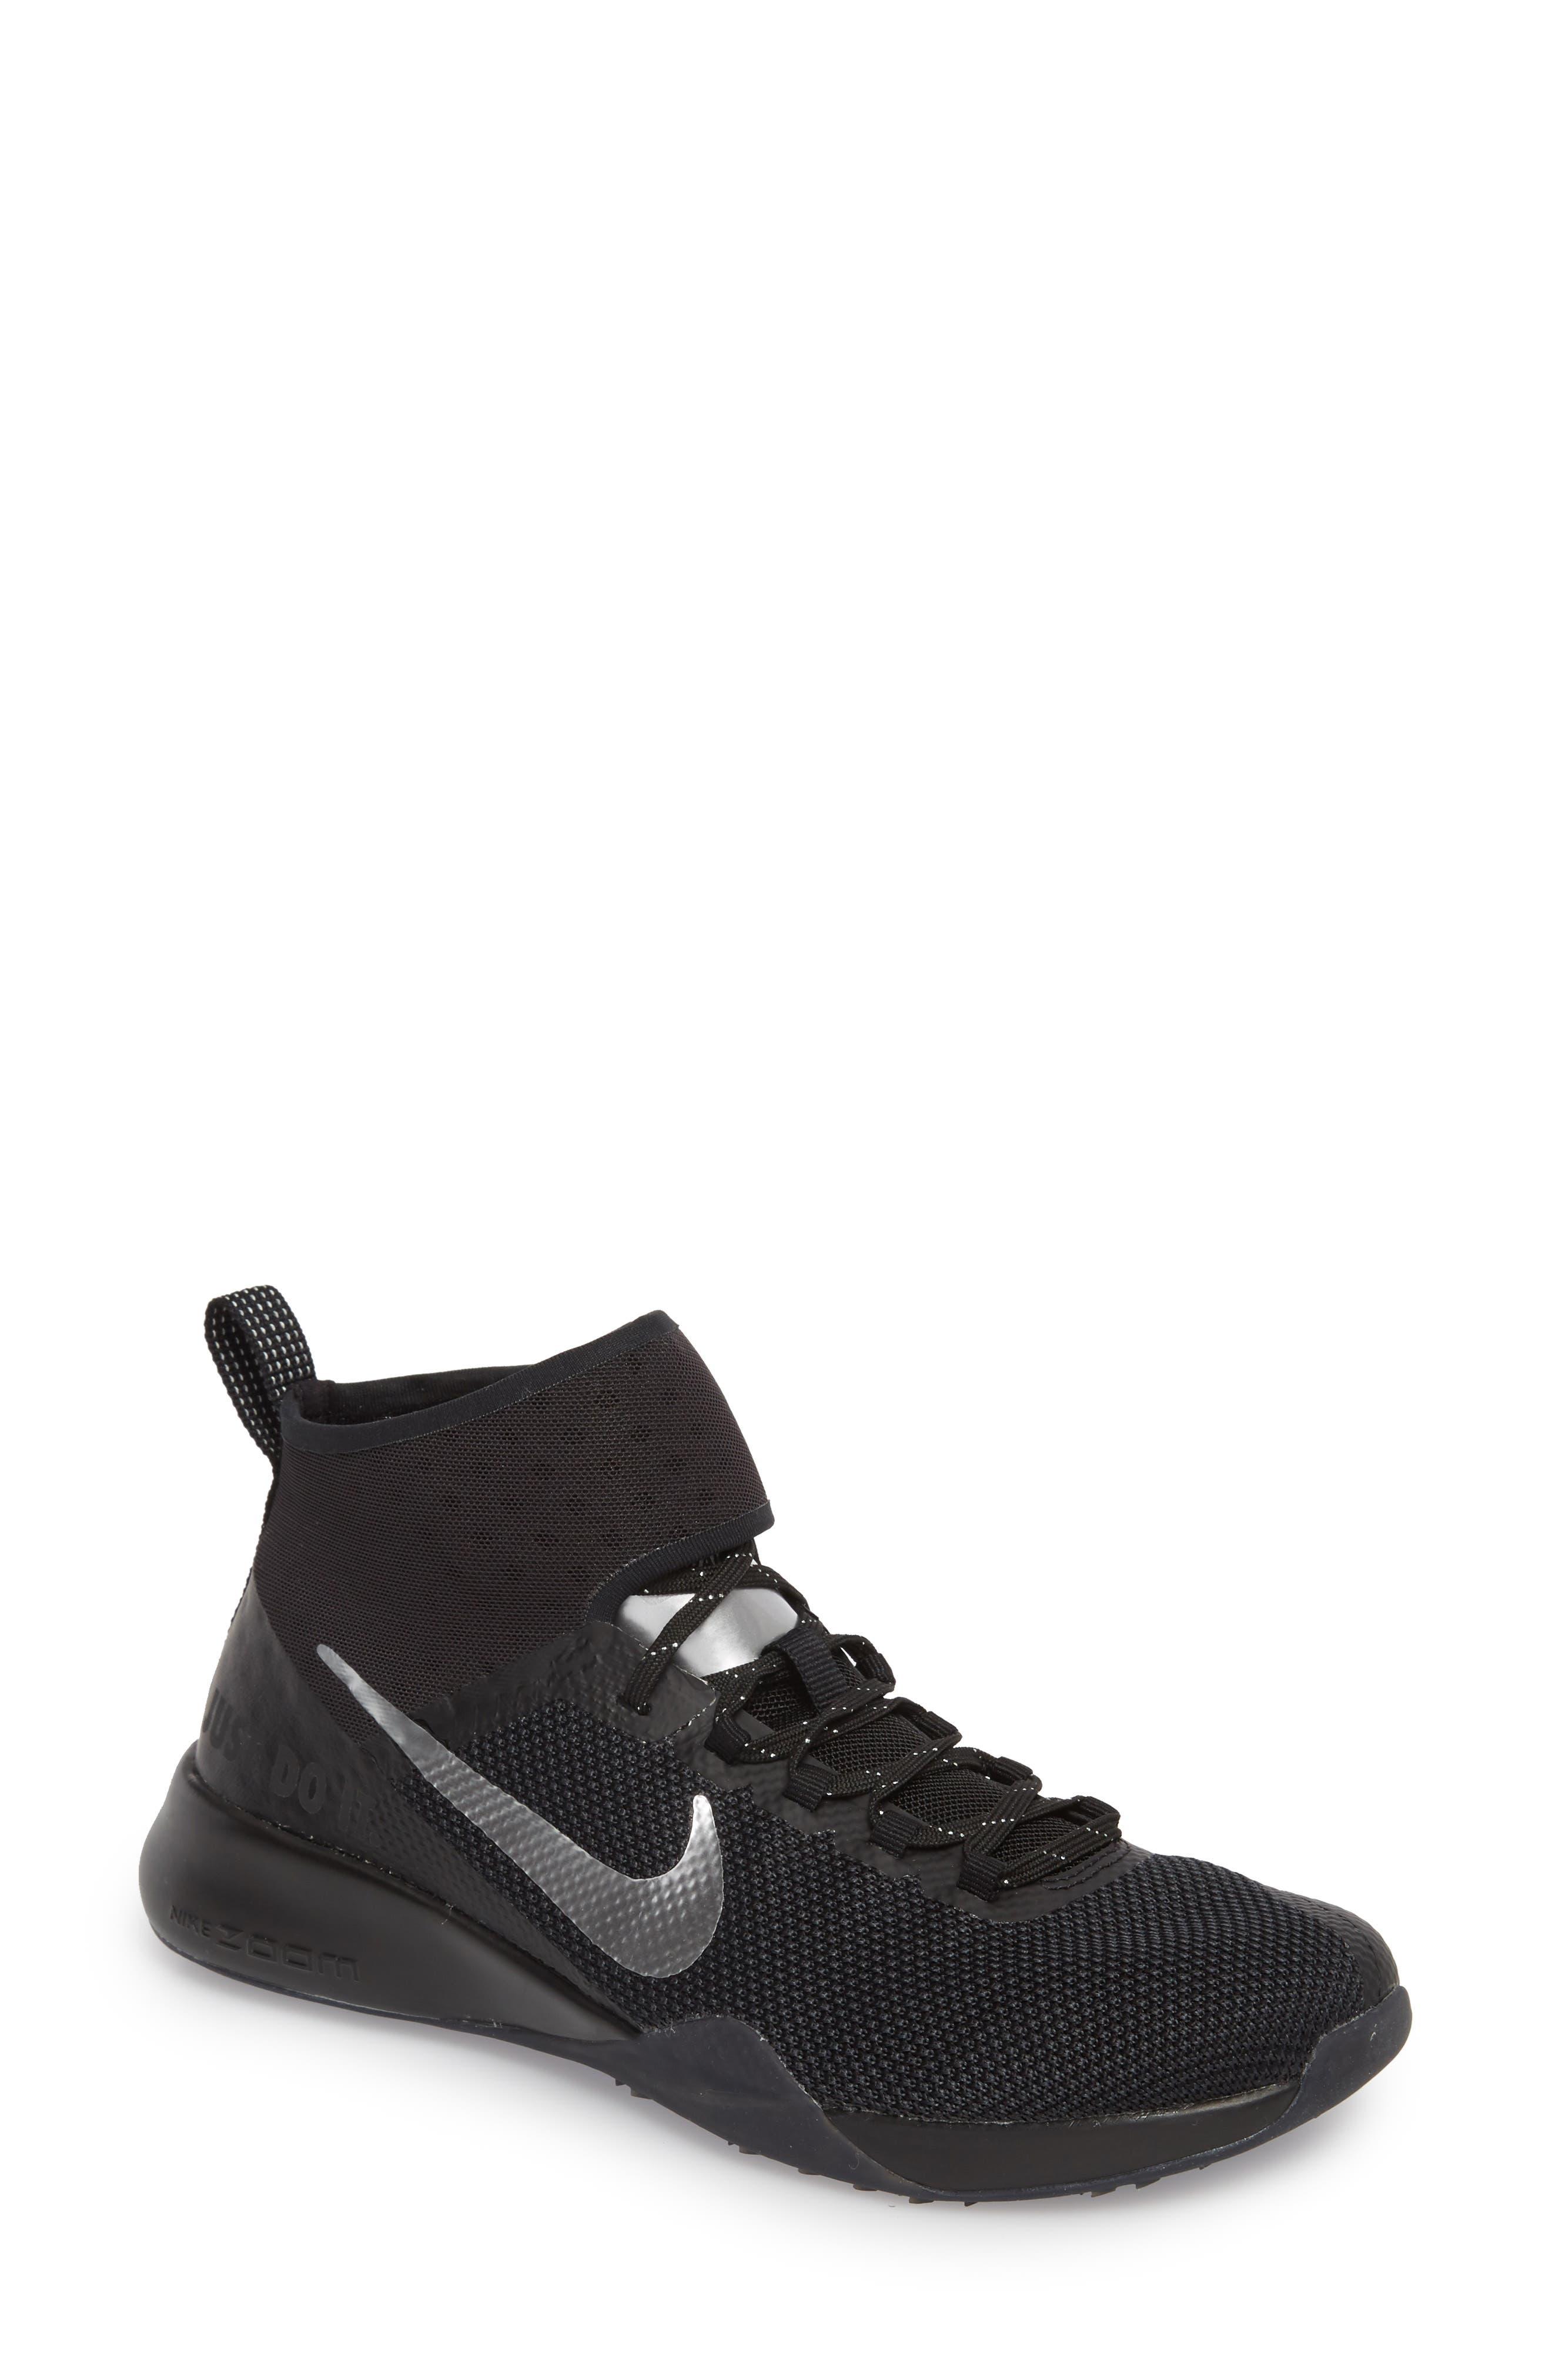 Alternate Image 1 Selected - Nike Air Zoom Strong 2 Selfie Training Shoe (Women)